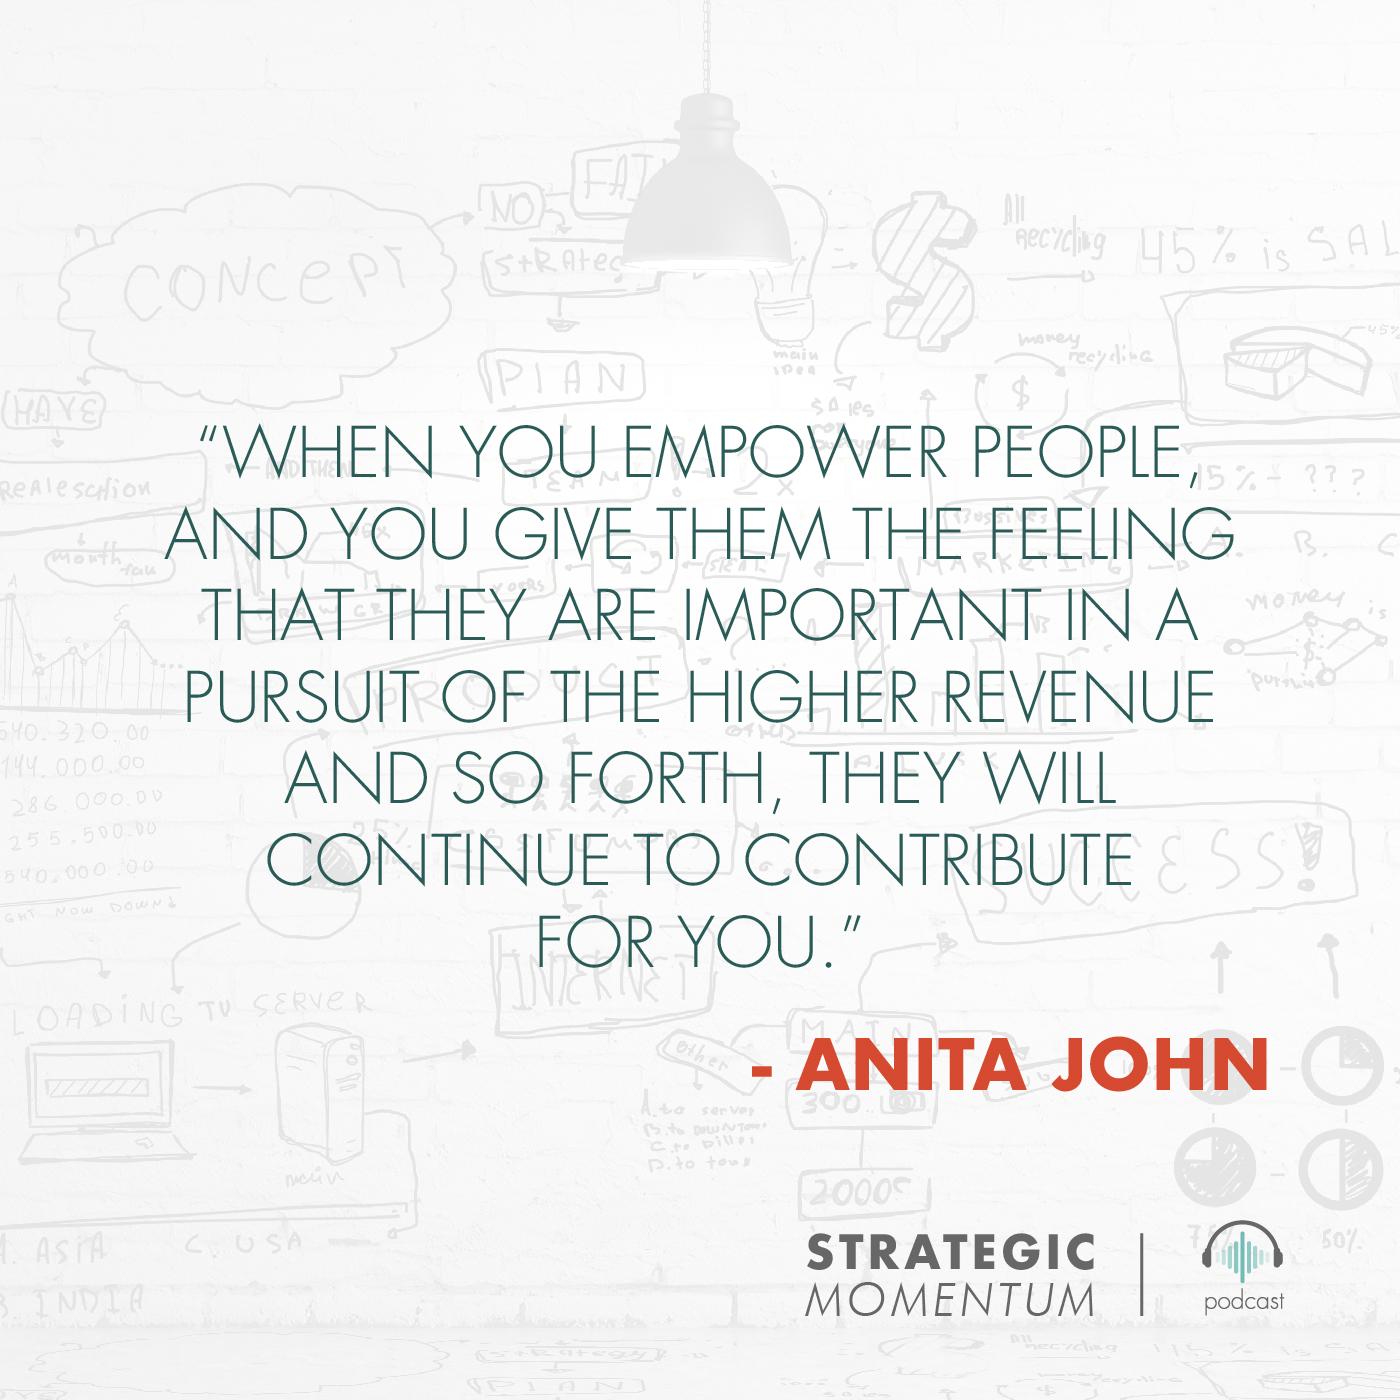 Anita John Quote | Strategic Momentum Podcast